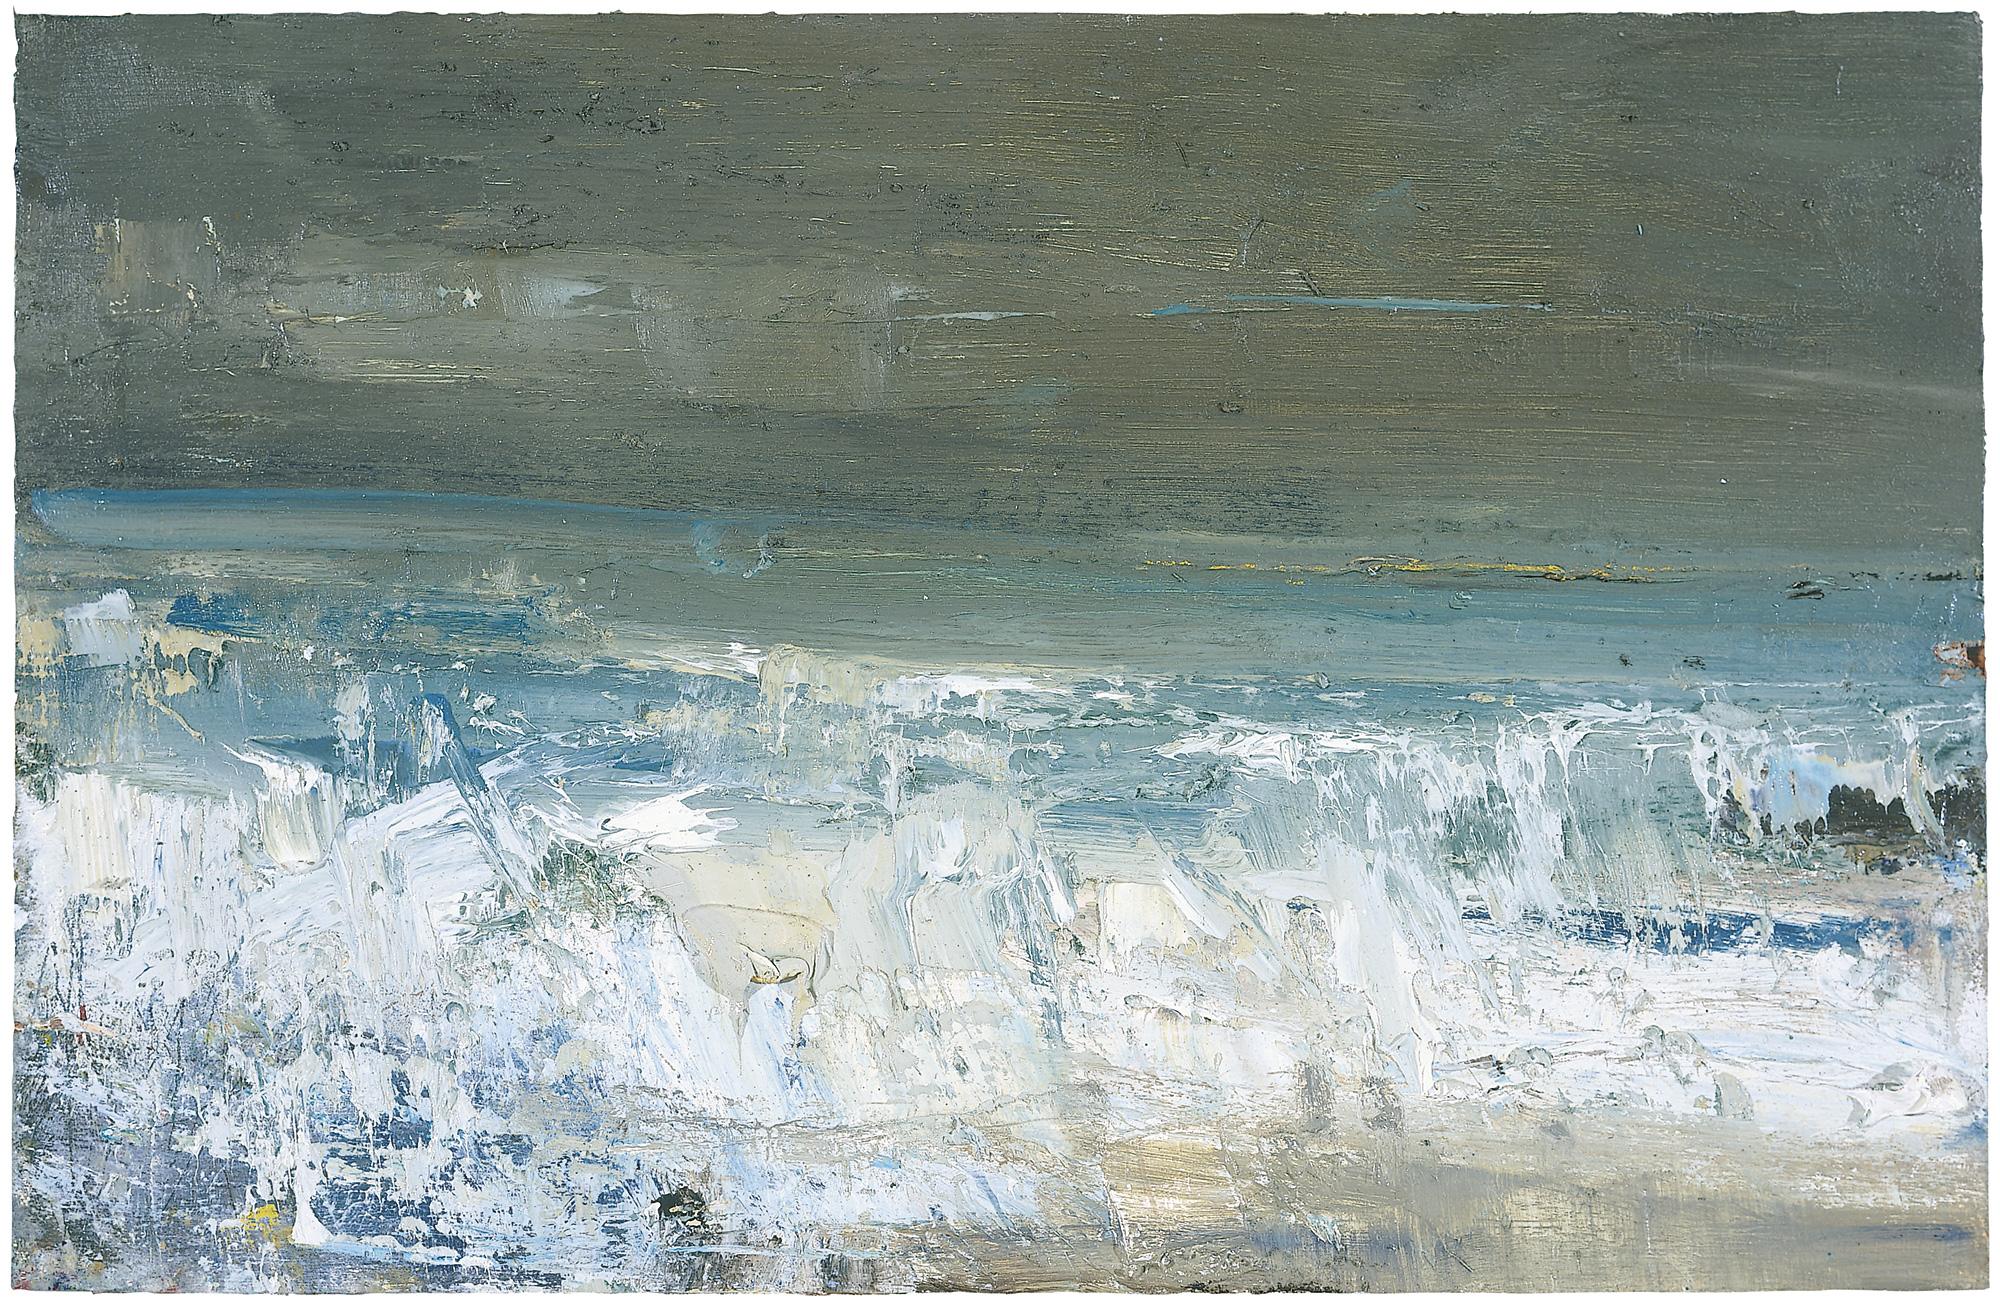 Storm Green Seas.  Oil on Board. 24 x 37 cm.  Sold